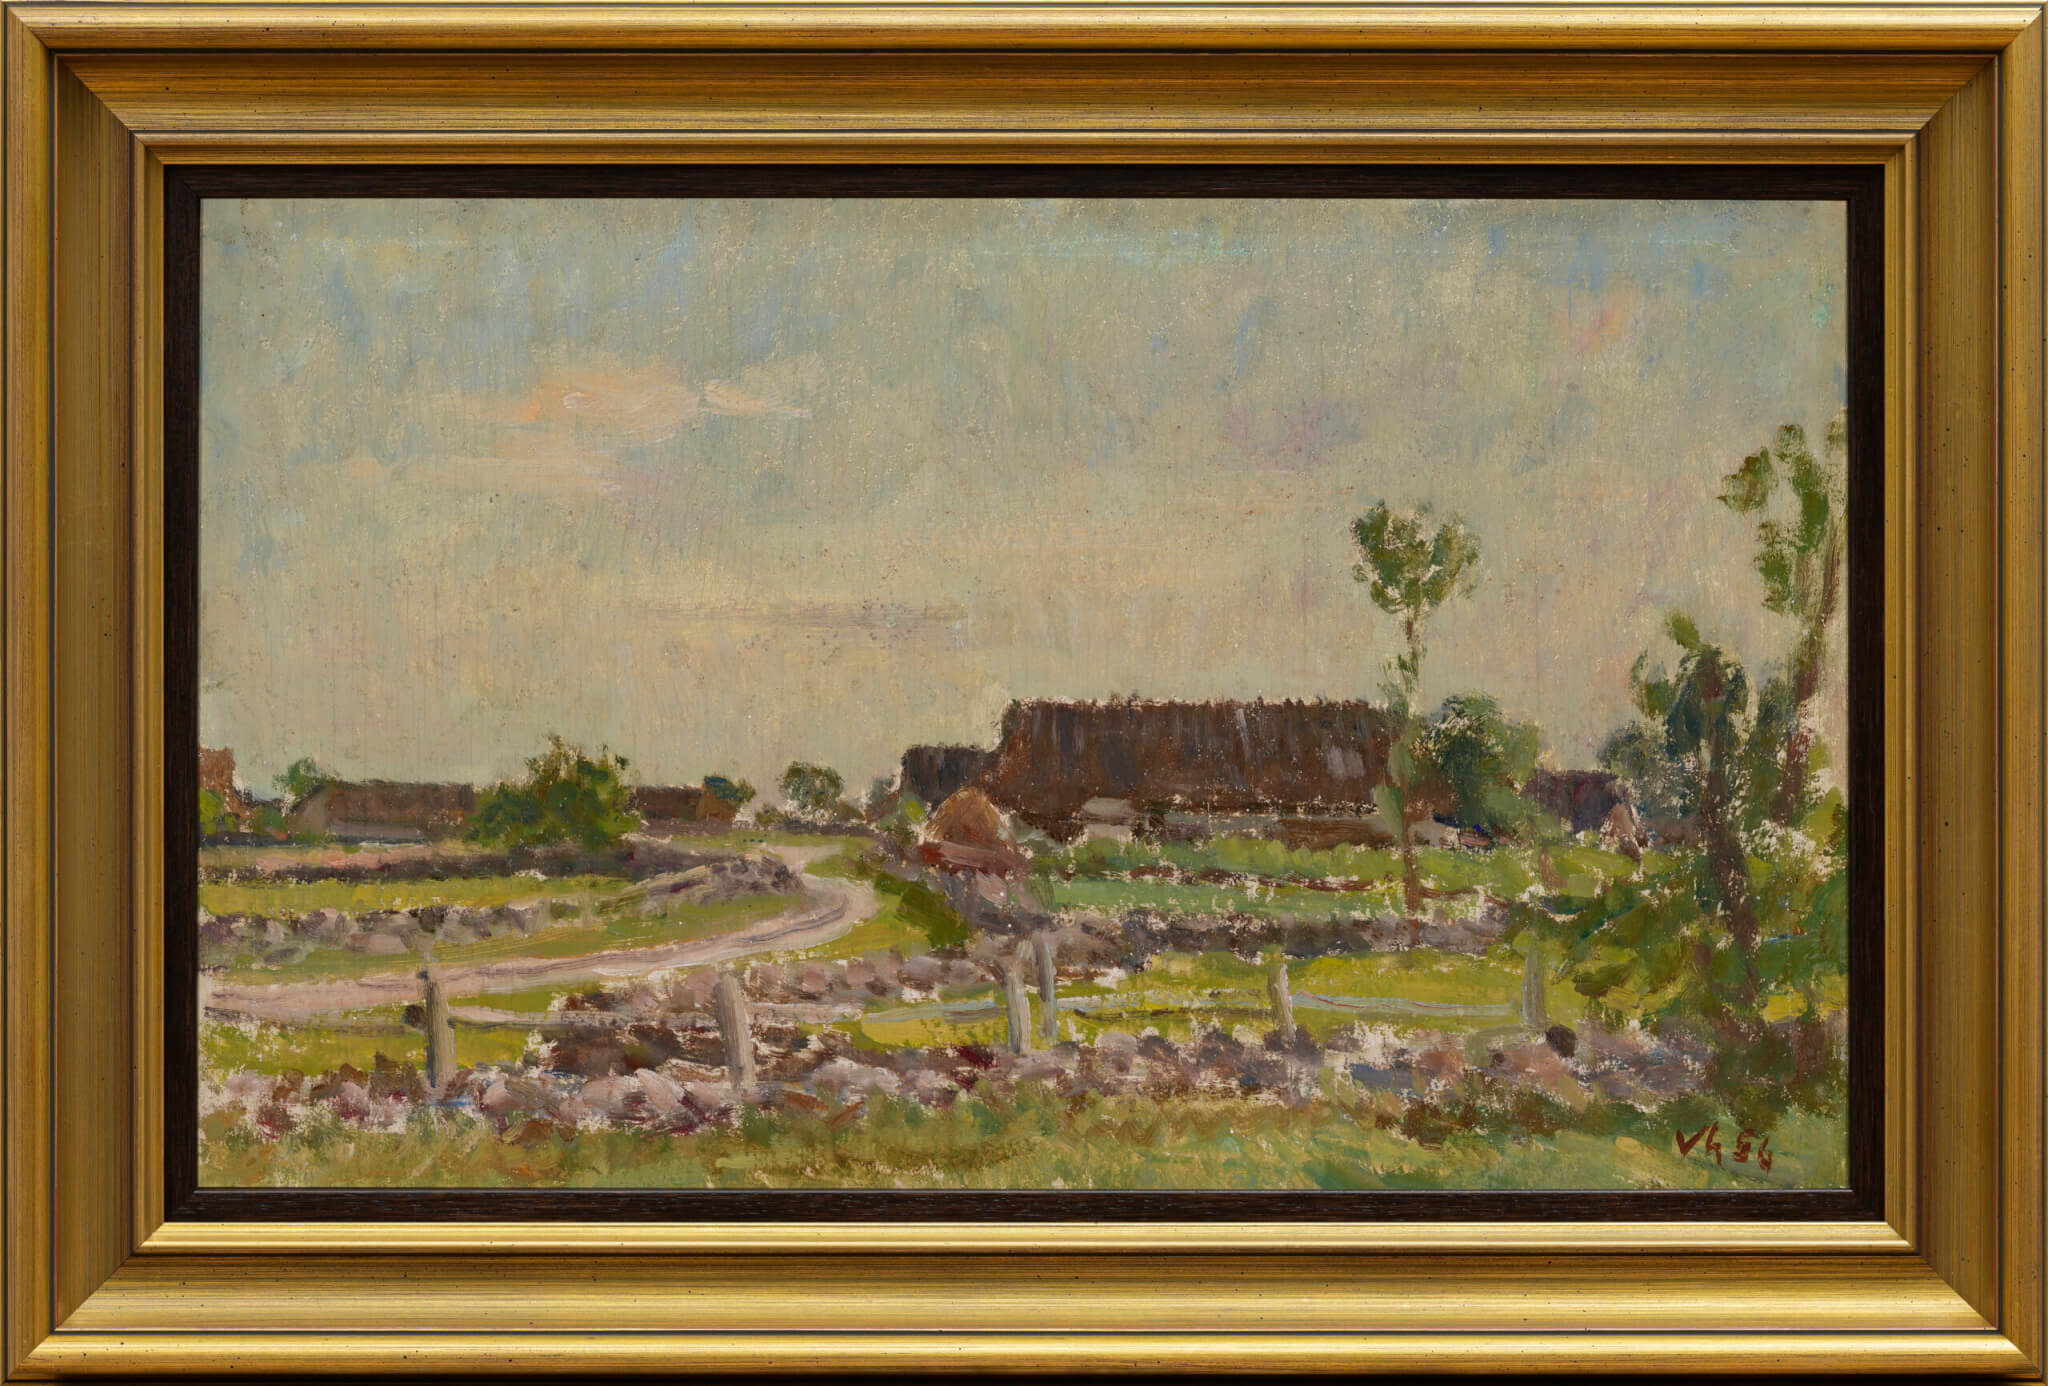 Johannes-Võerahansu-Allee-galerii-oksjonil